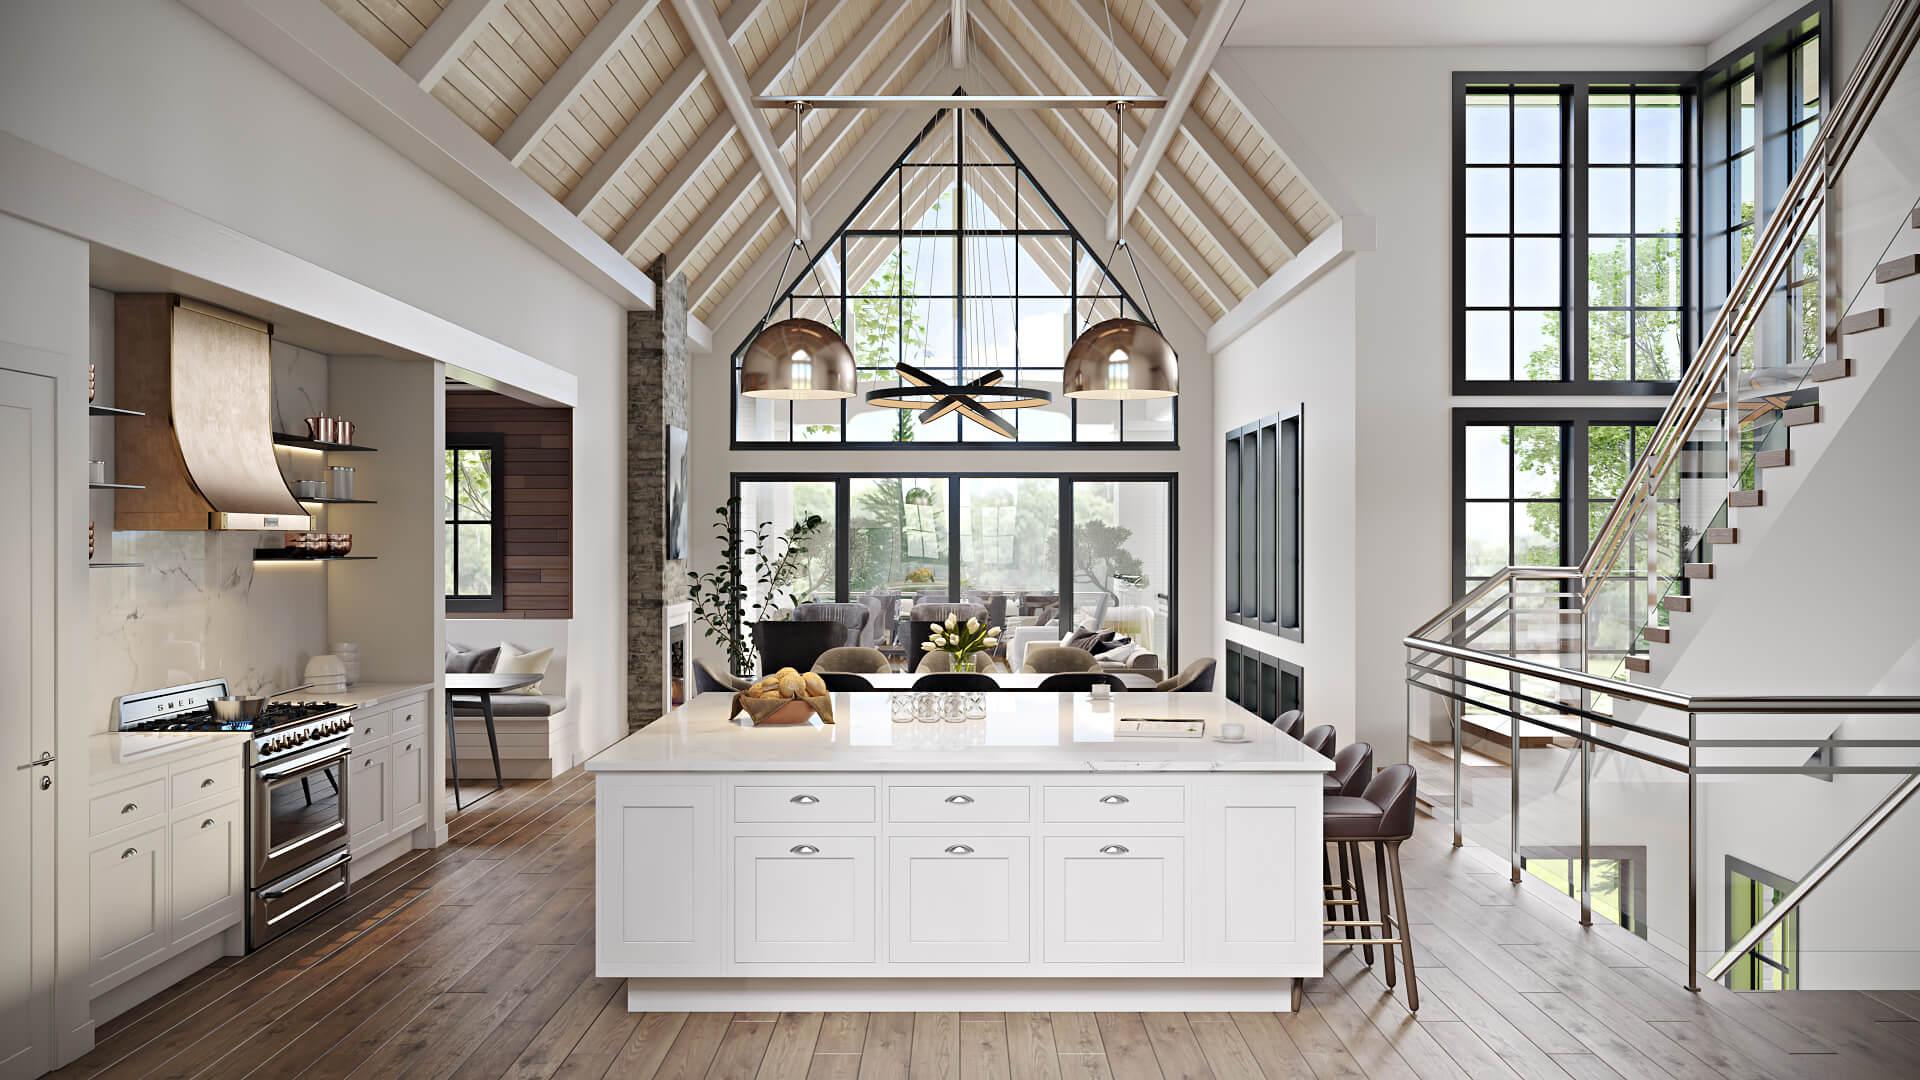 CGI for an Elegant Kitchen